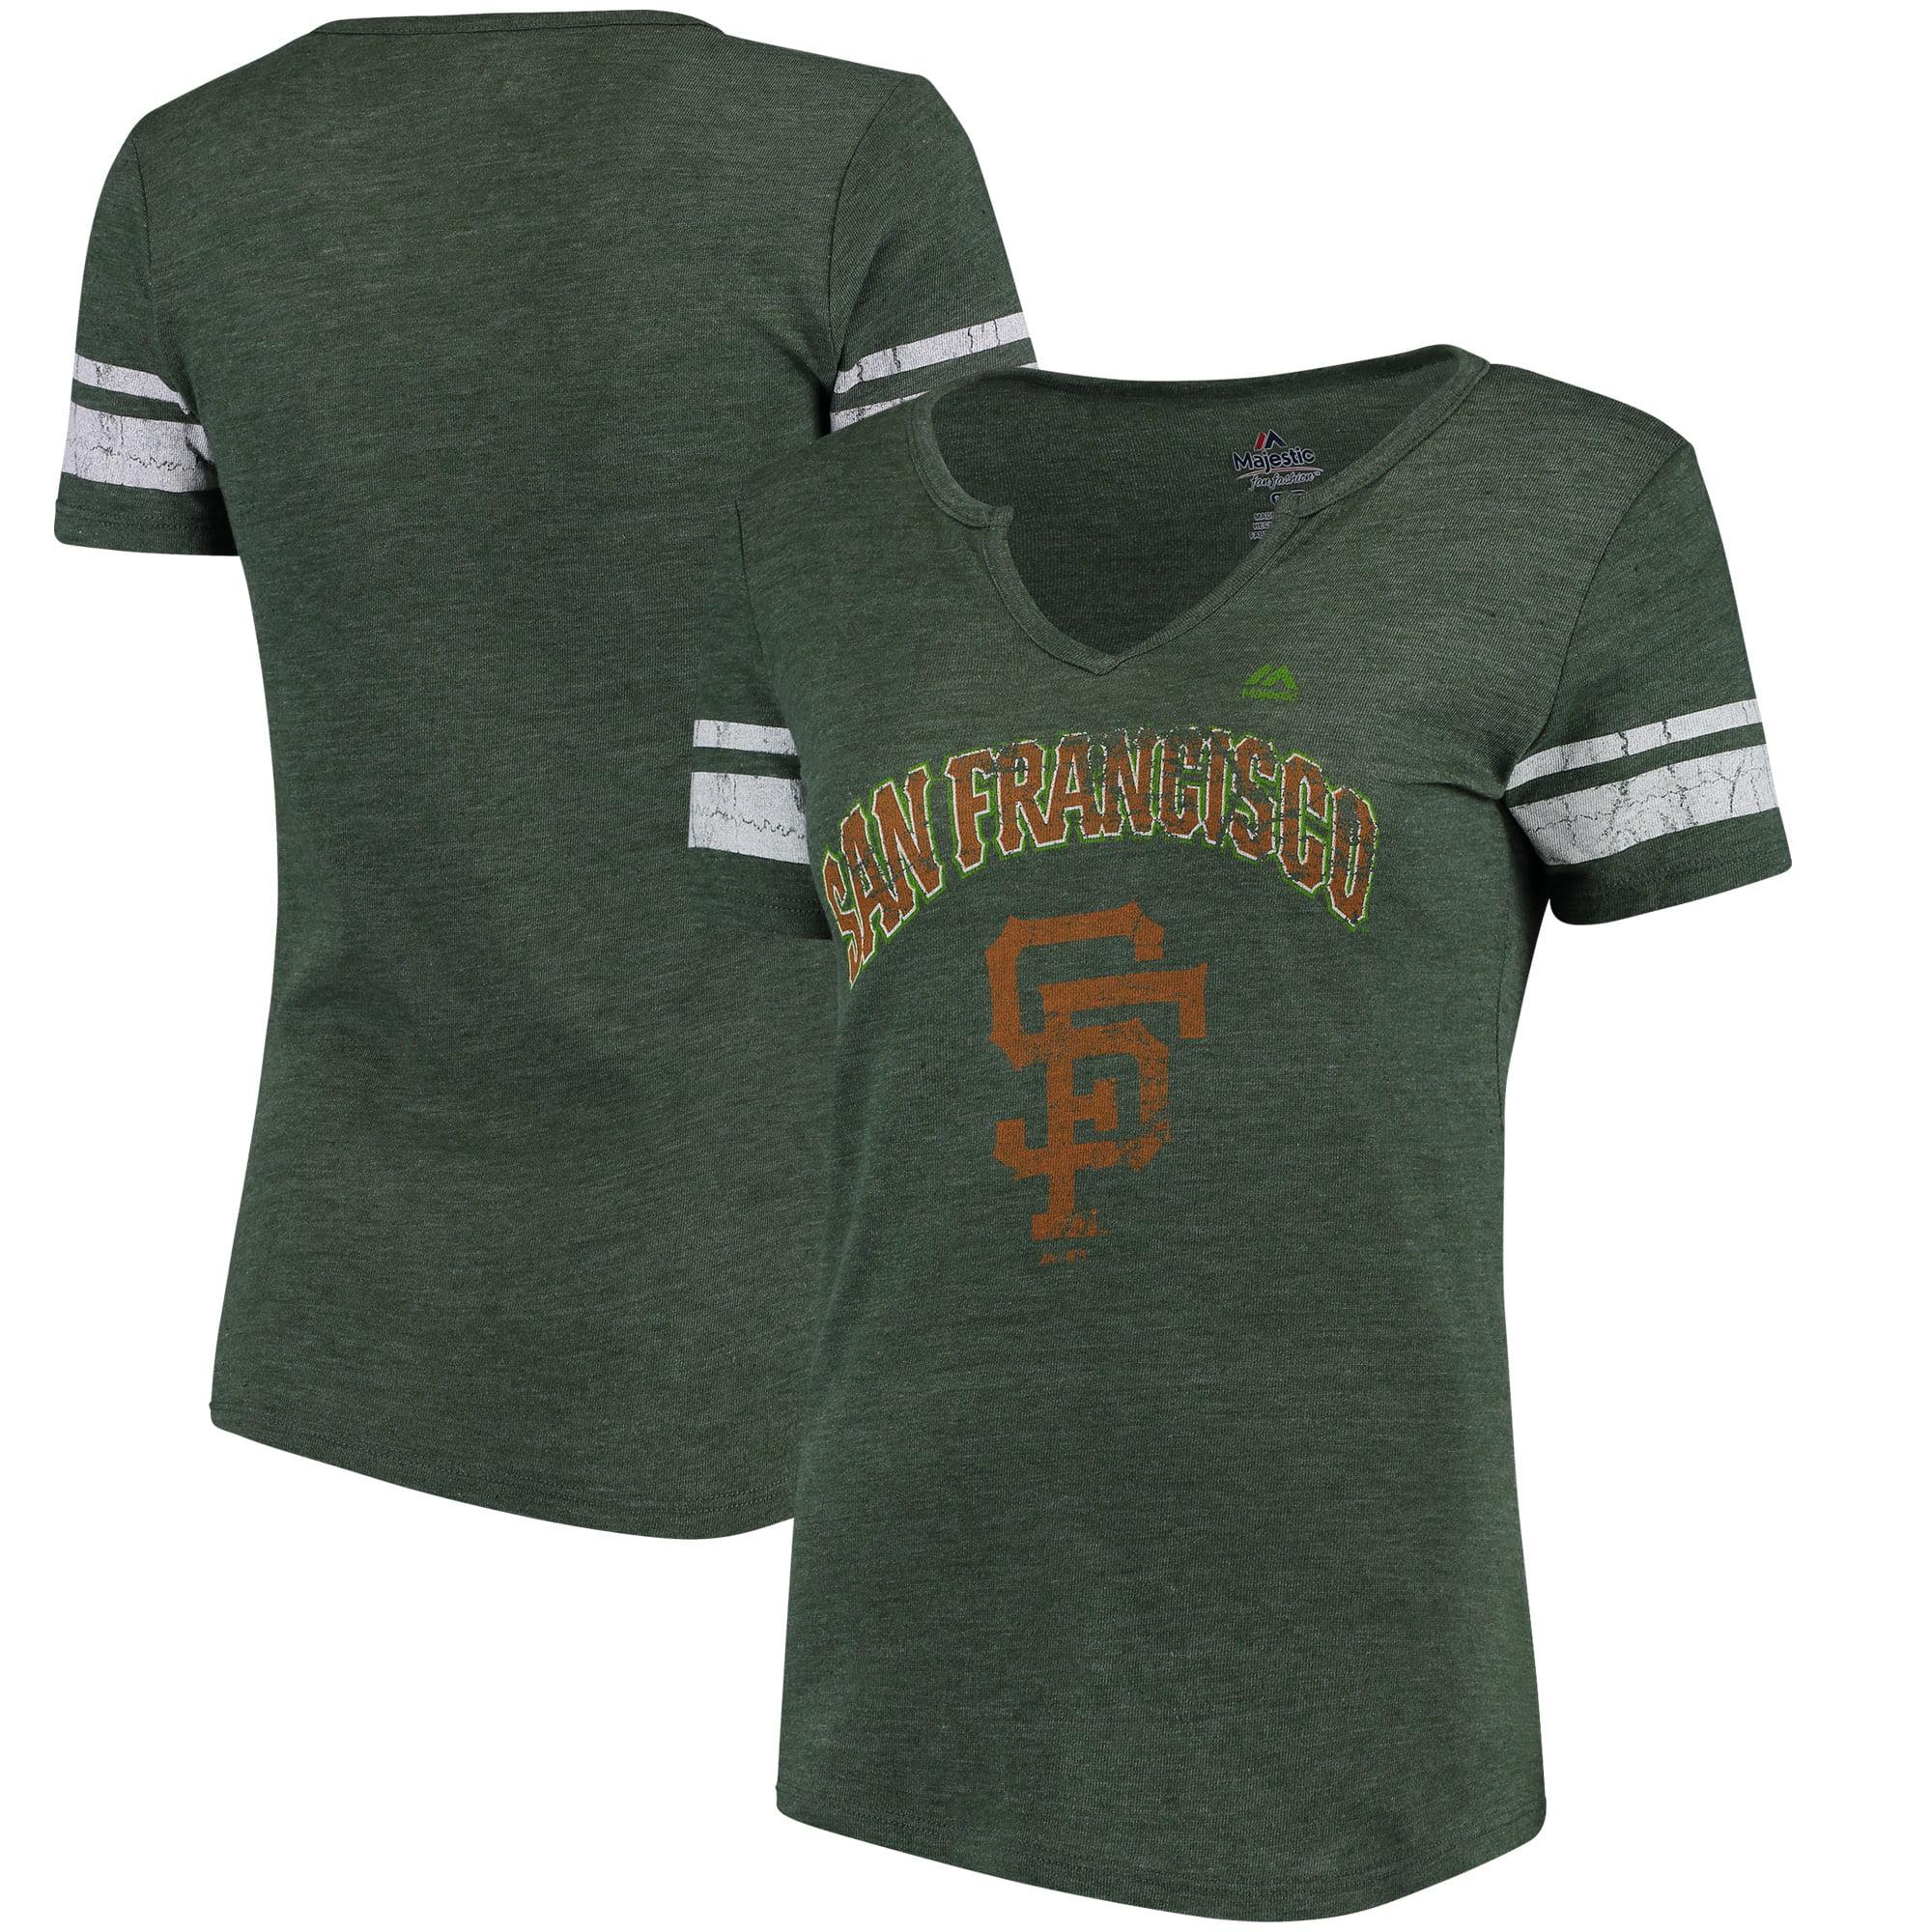 San Francisco Giants Majestic Women's Celtic 'Tude Notch Neck Tri-Blend T-Shirt - Green